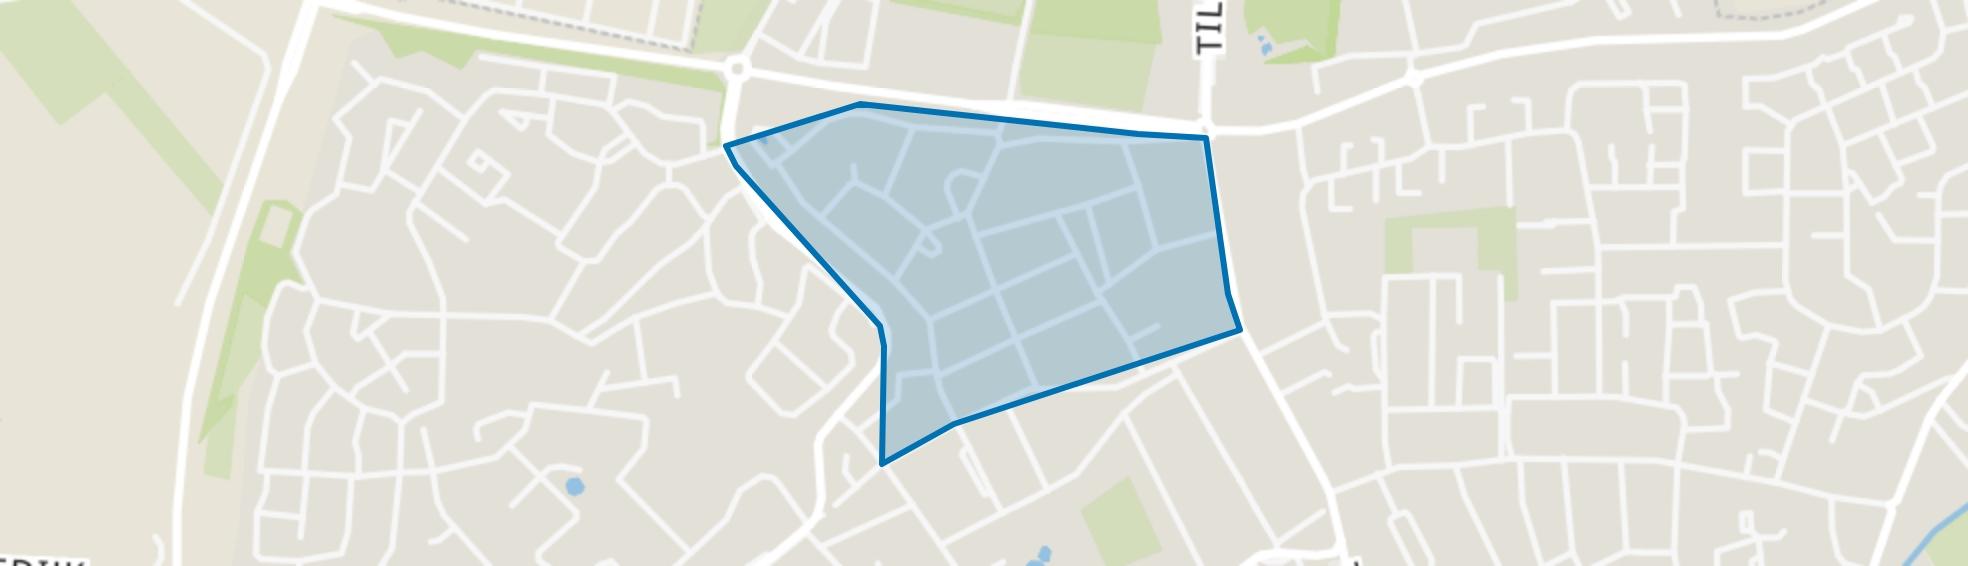 't Ven, Goirle map